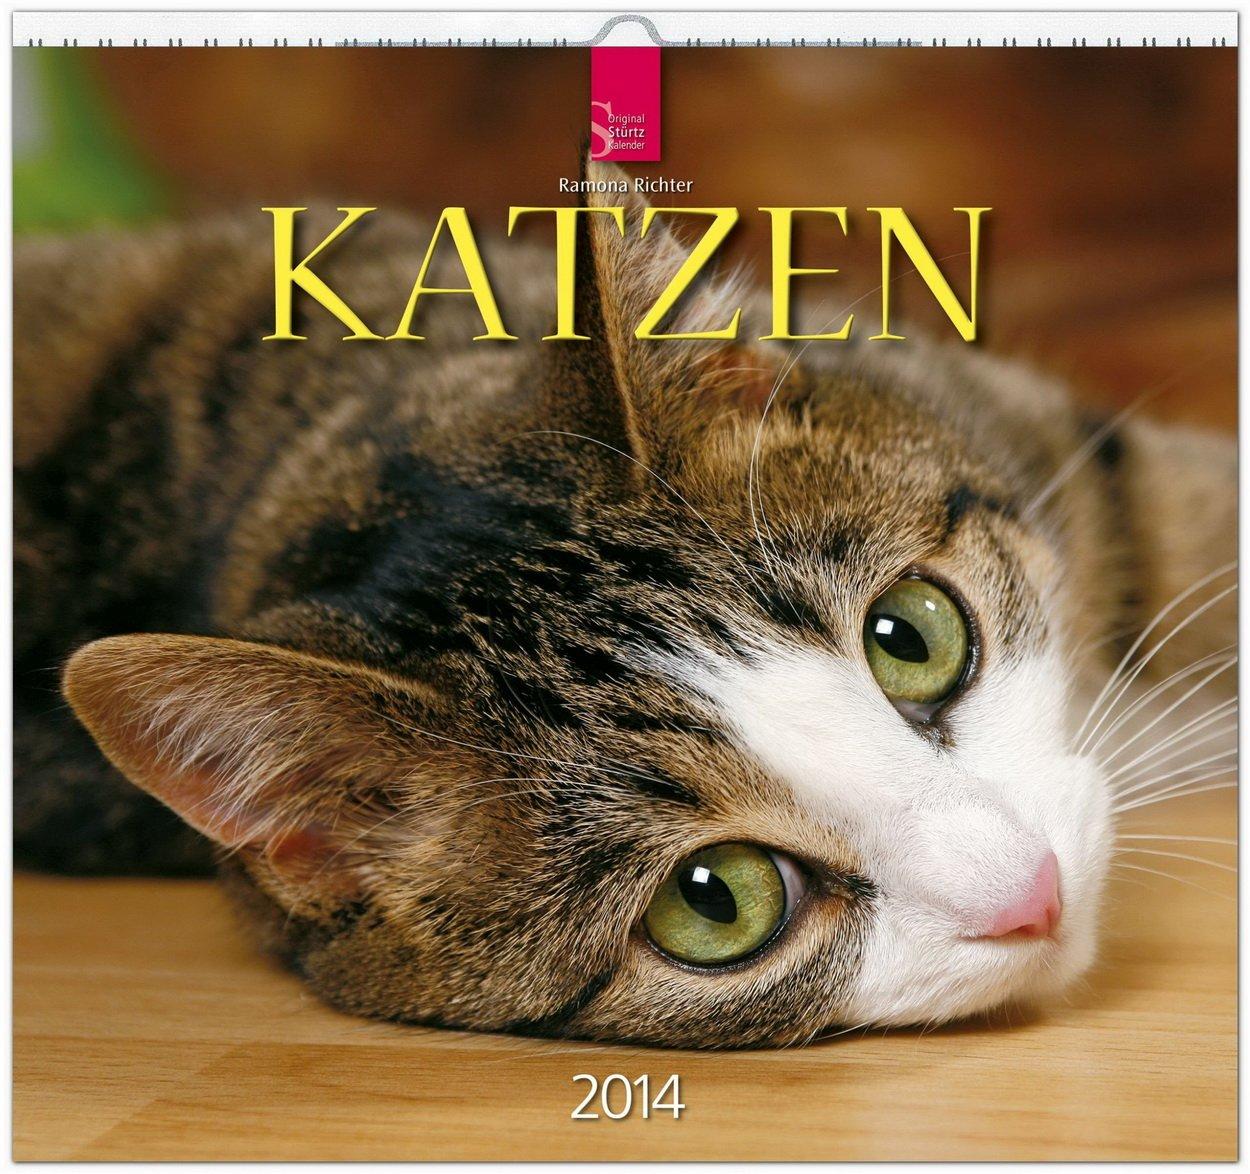 Katzen 2014: Original Stürtz-Kalender - Mittelformat-Kalender 33 x 31 cm [Spiralbindung]